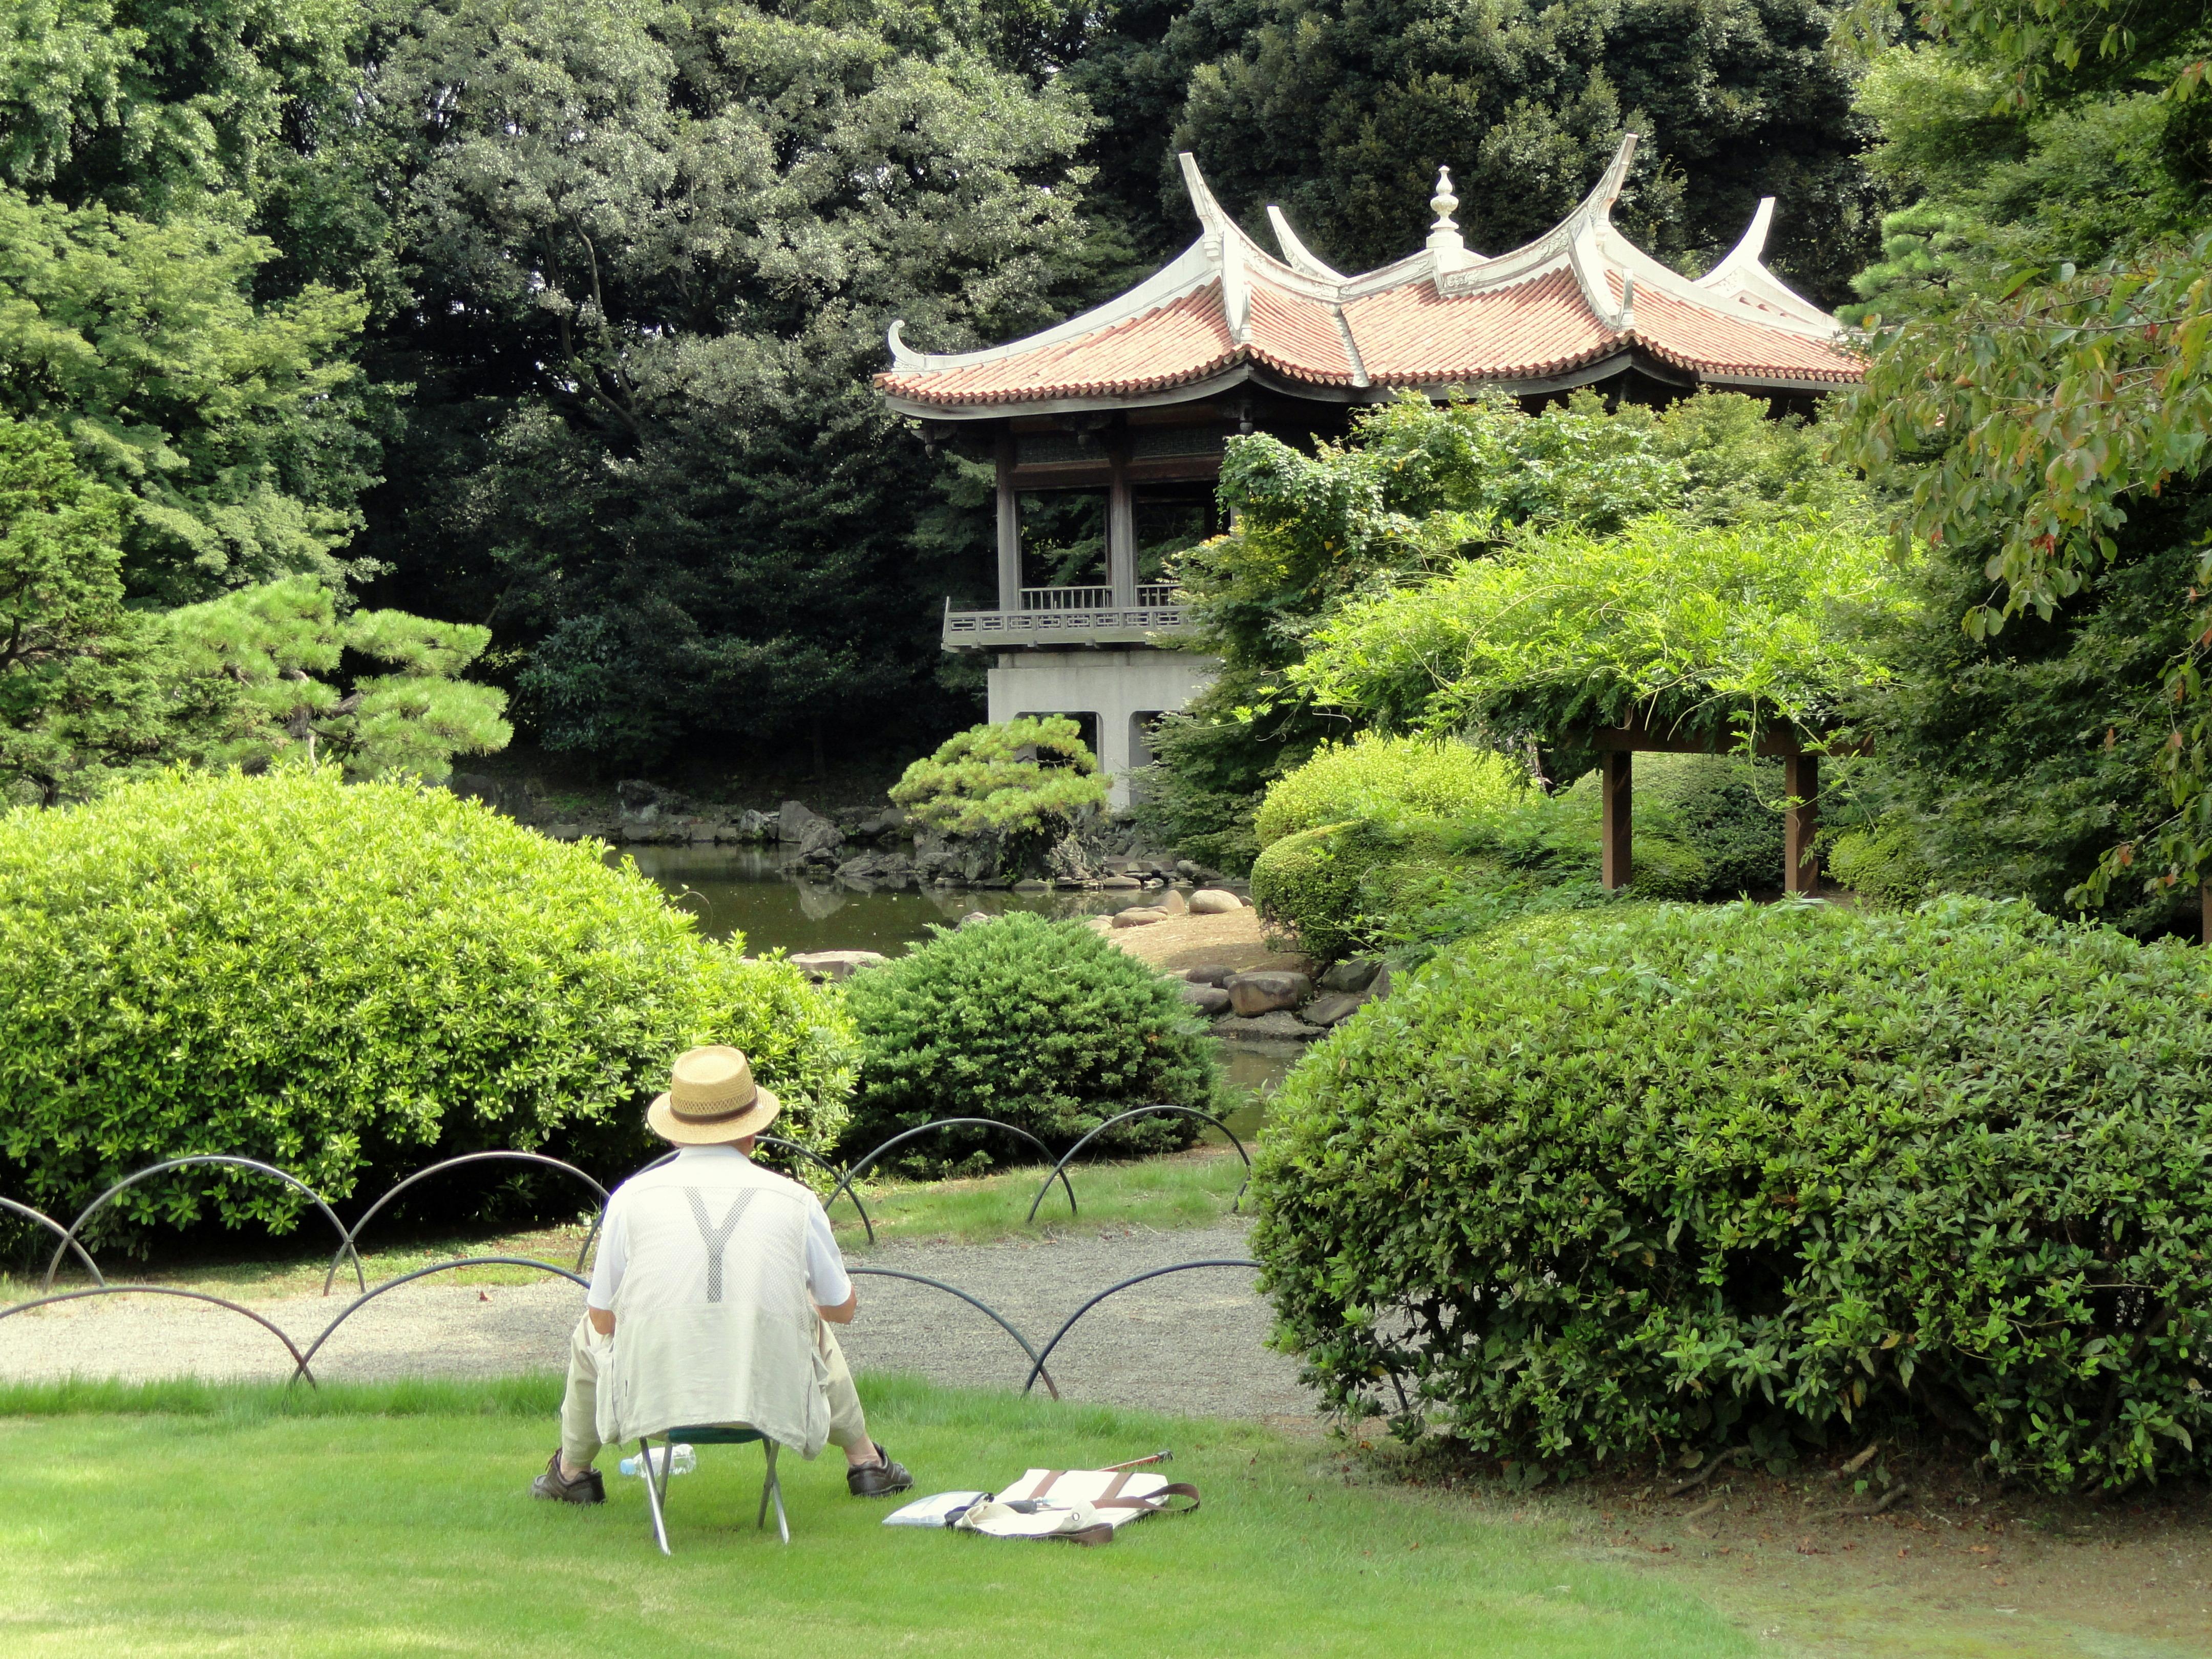 File:Shinjuku Gyoen National Garden - DSC05104.JPG